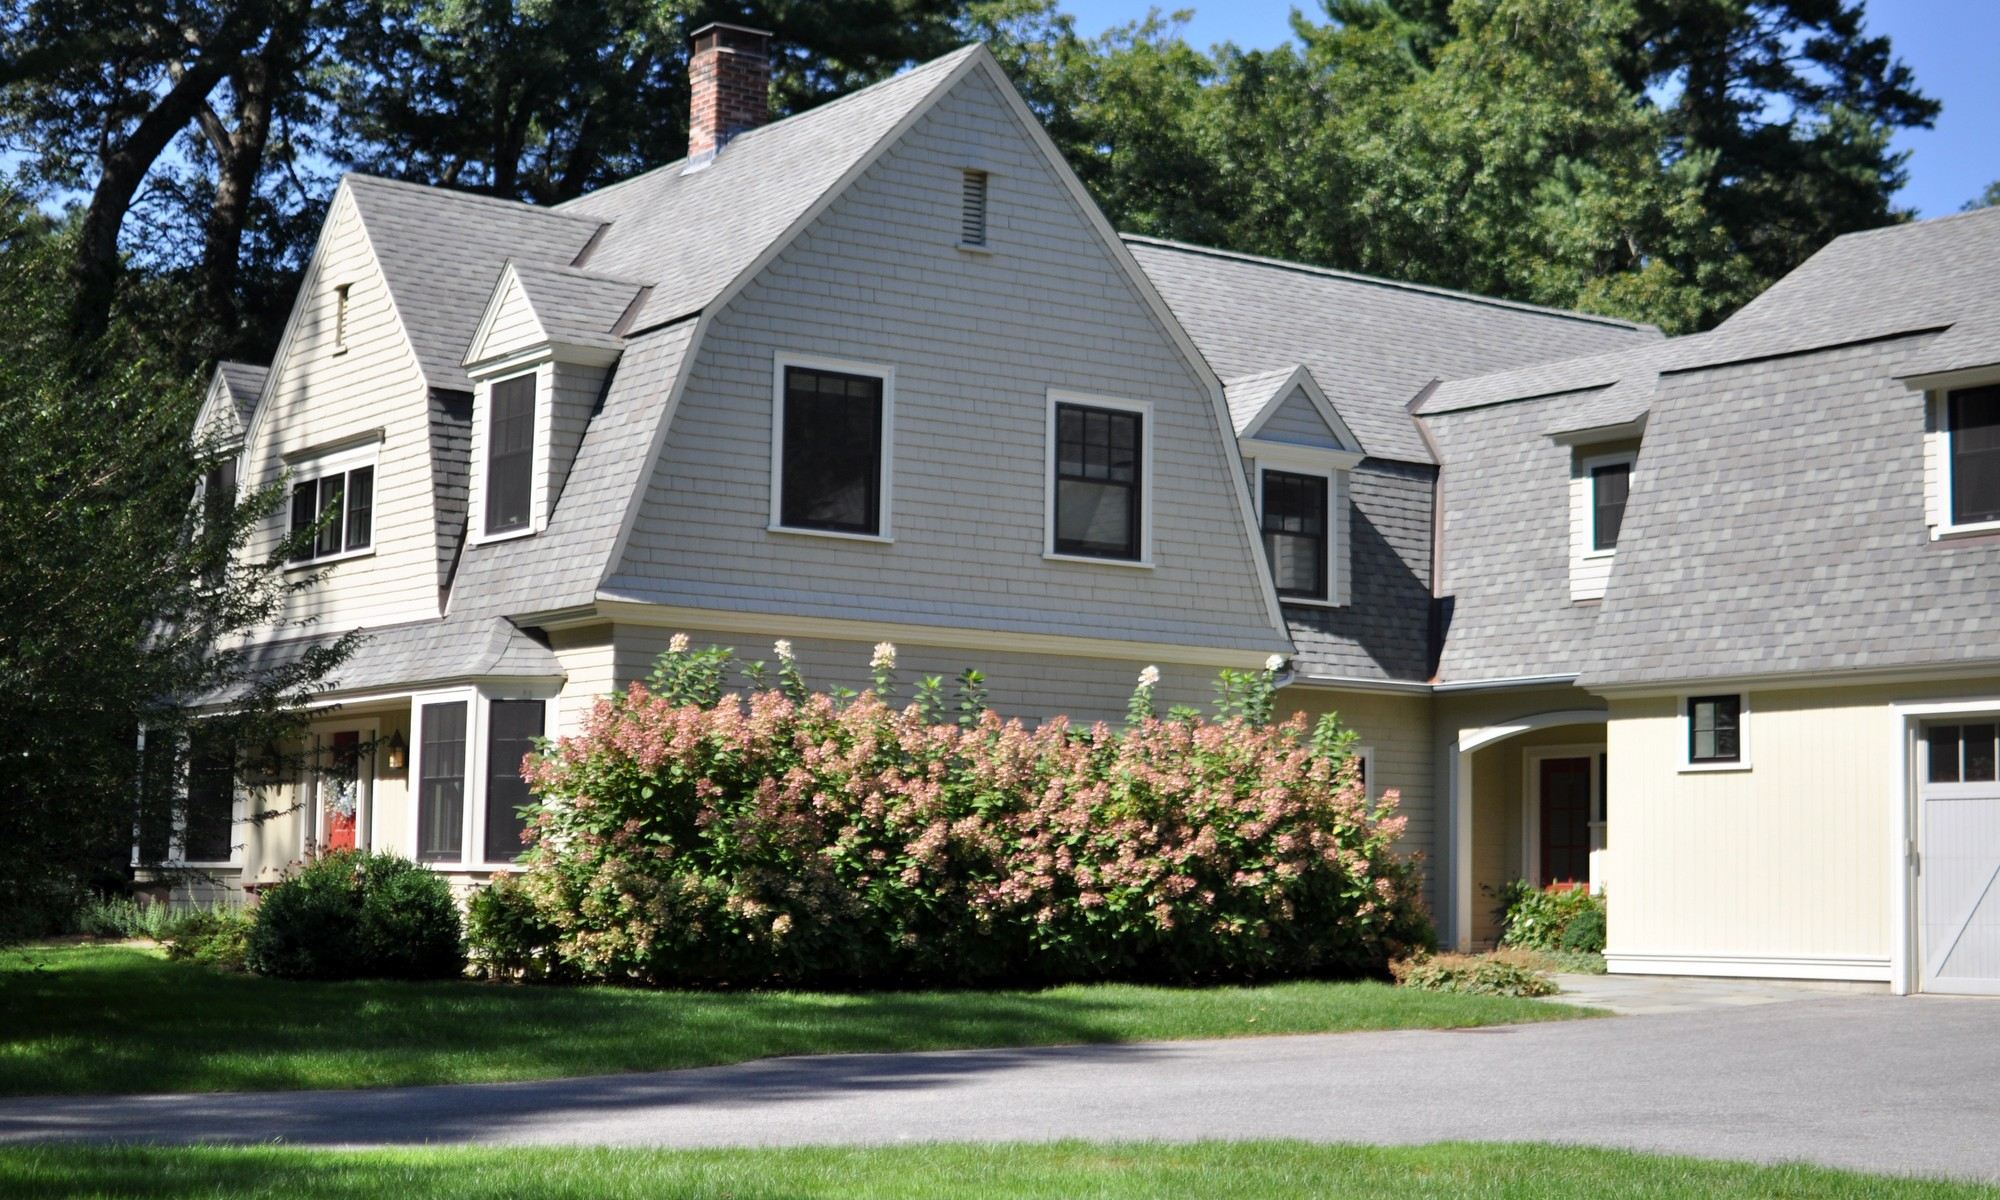 Property For Sale at Desirable Ridge Neighborhood